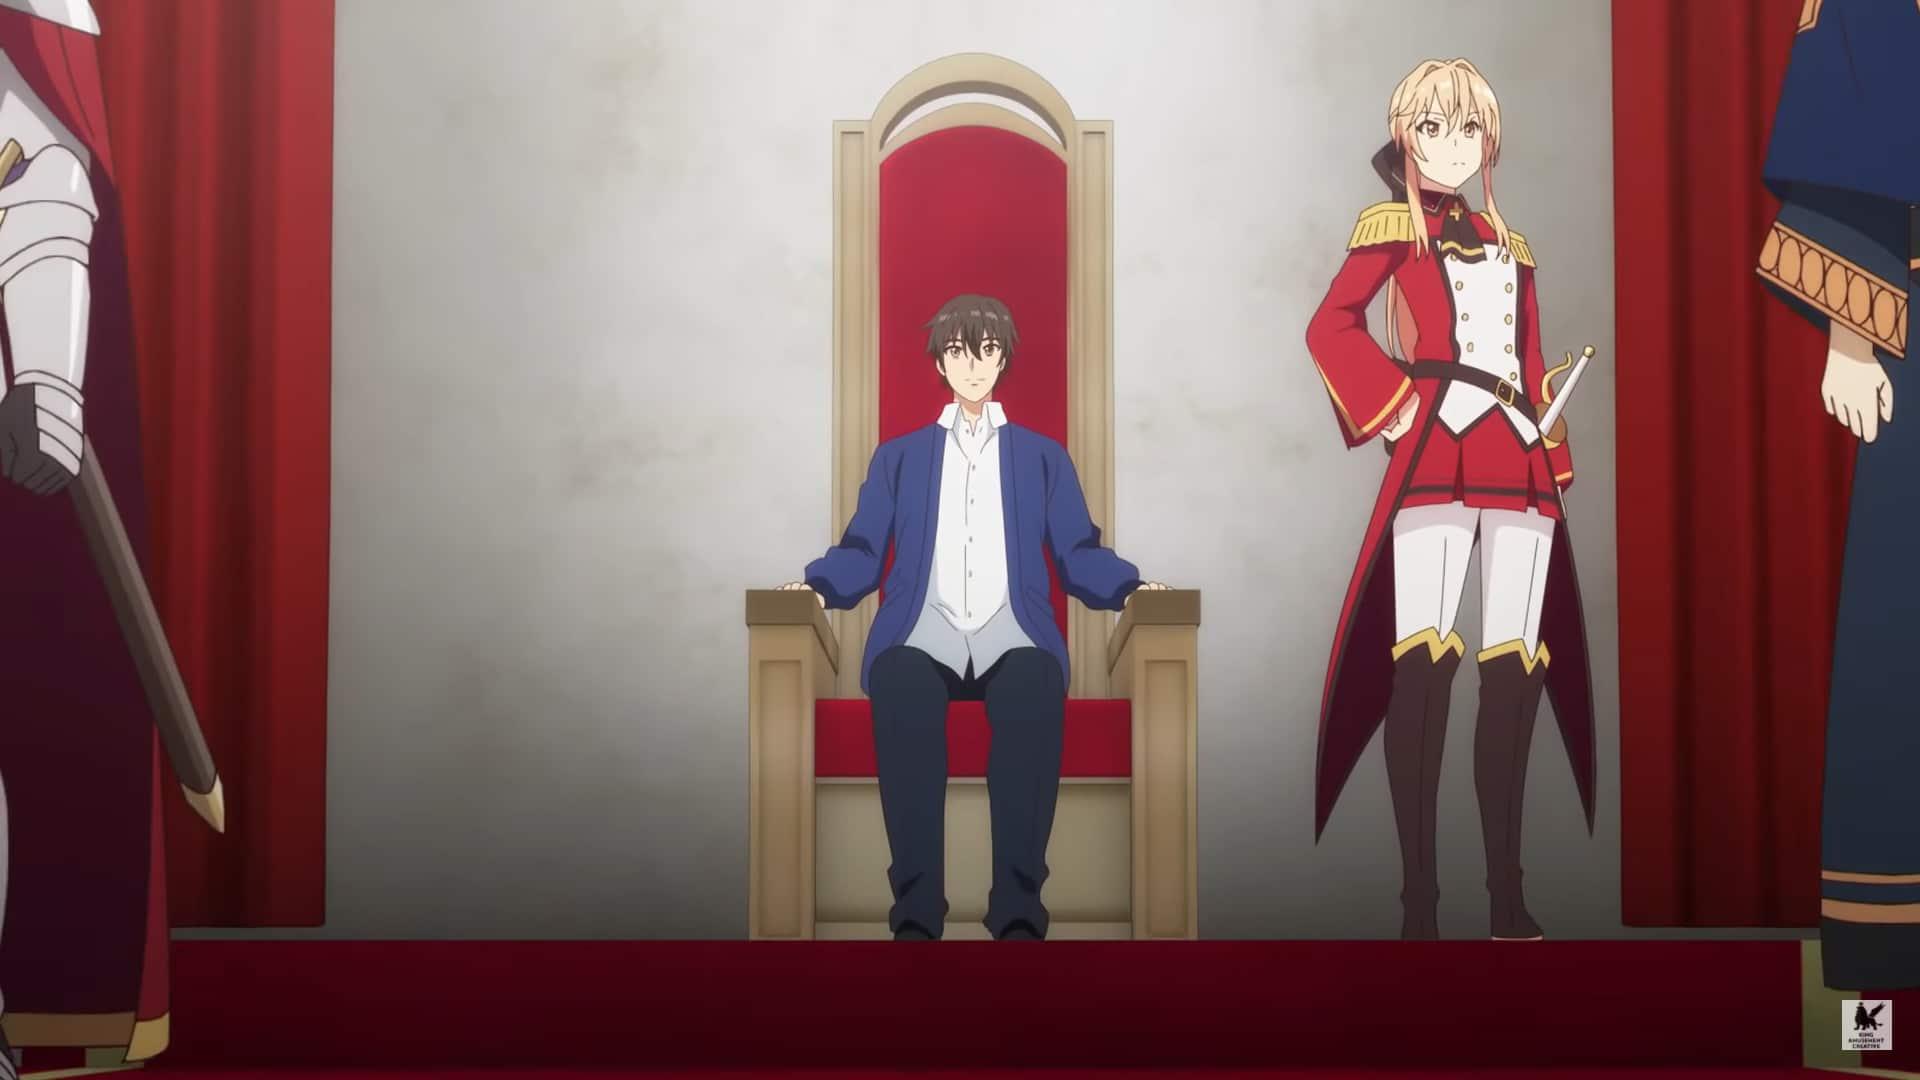 How a Realist Hero Rebuilt the Kingdom - Anime